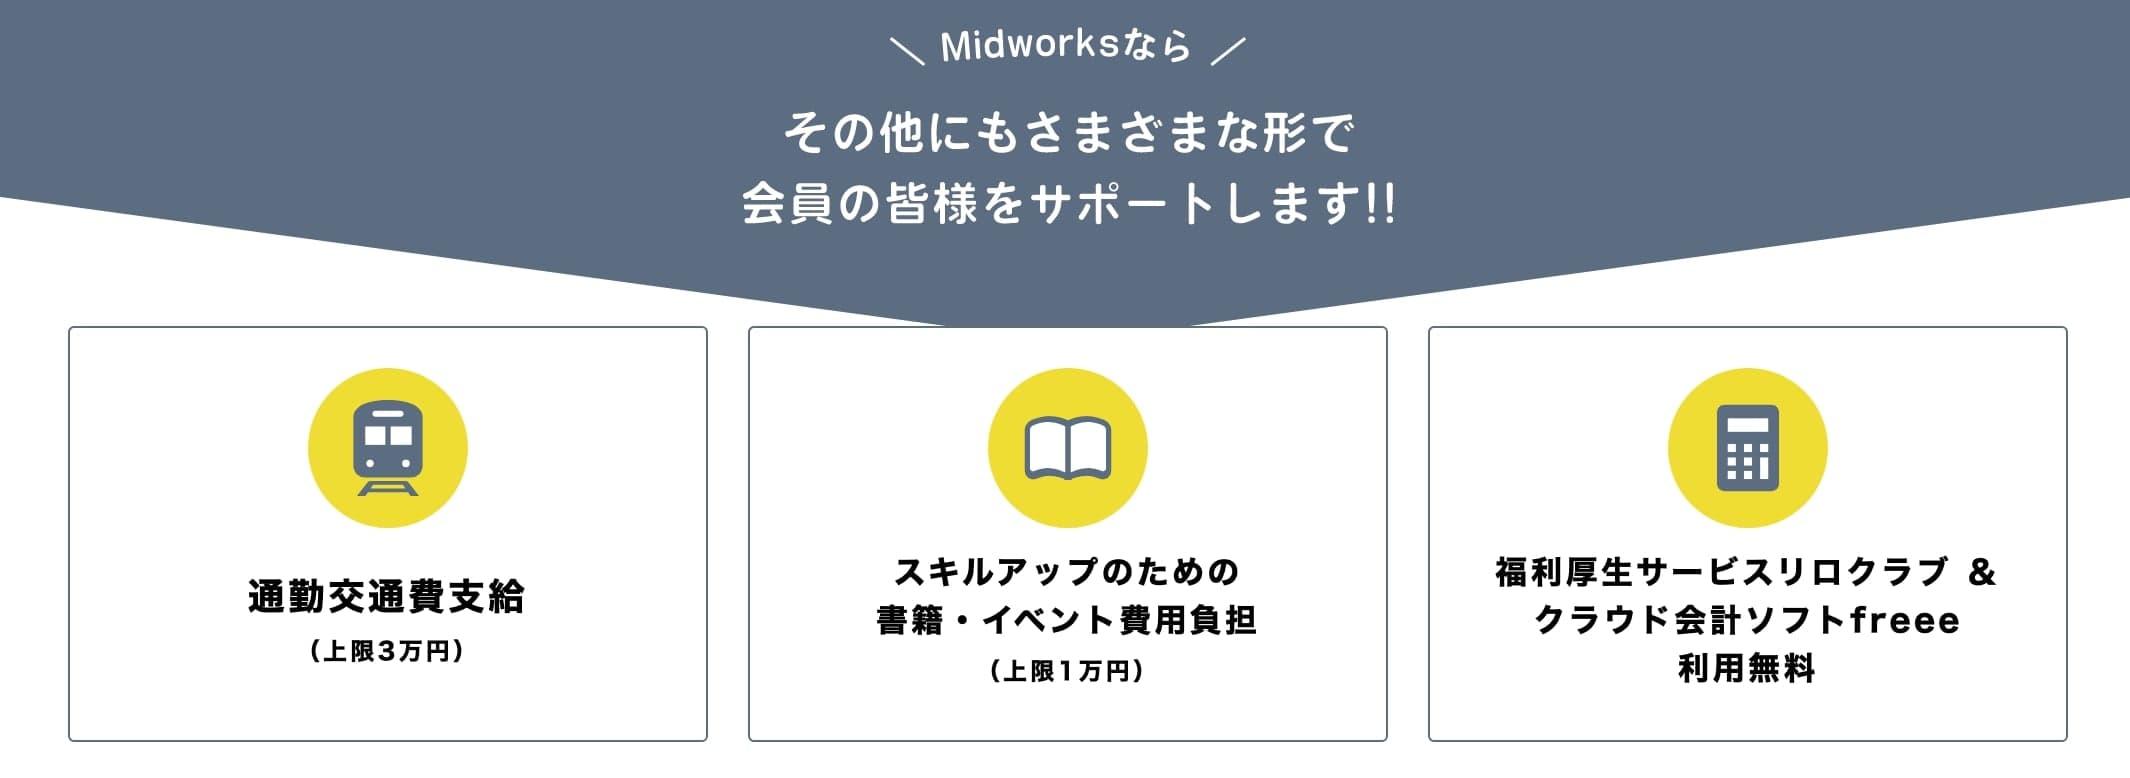 Midworks(ミッドワークス)のメリットと評判・口コミ